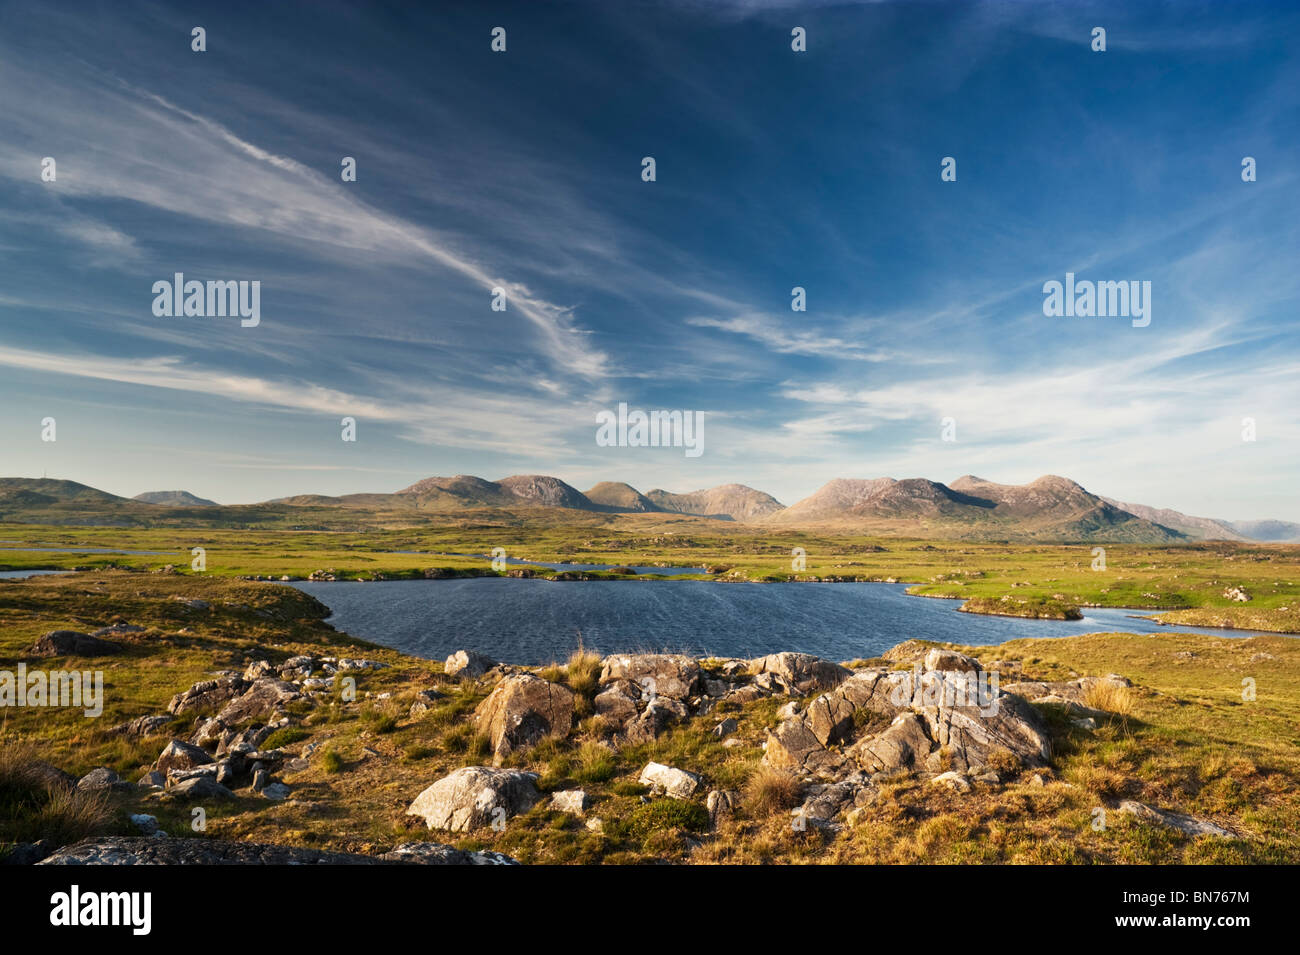 Lake at Arkeen More, overlooking the Twelve Bens mountain range, Connemara, County Galway, Ireland - Stock Image